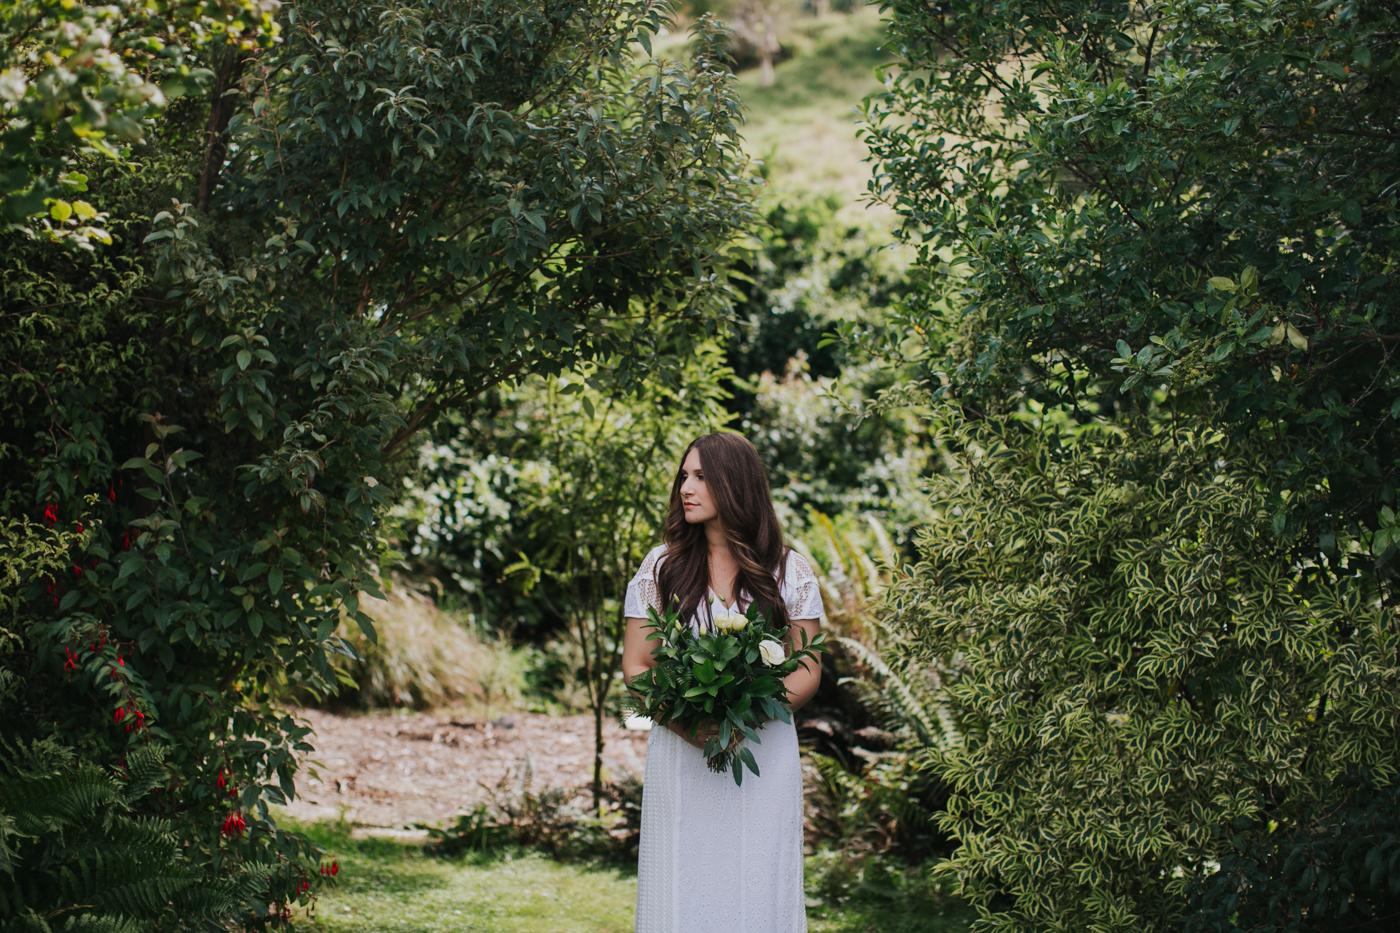 Ariana & Tim - Dunedin, New Zealand Wedding - Destination Wedding - Samantha Heather Photography-52.jpg